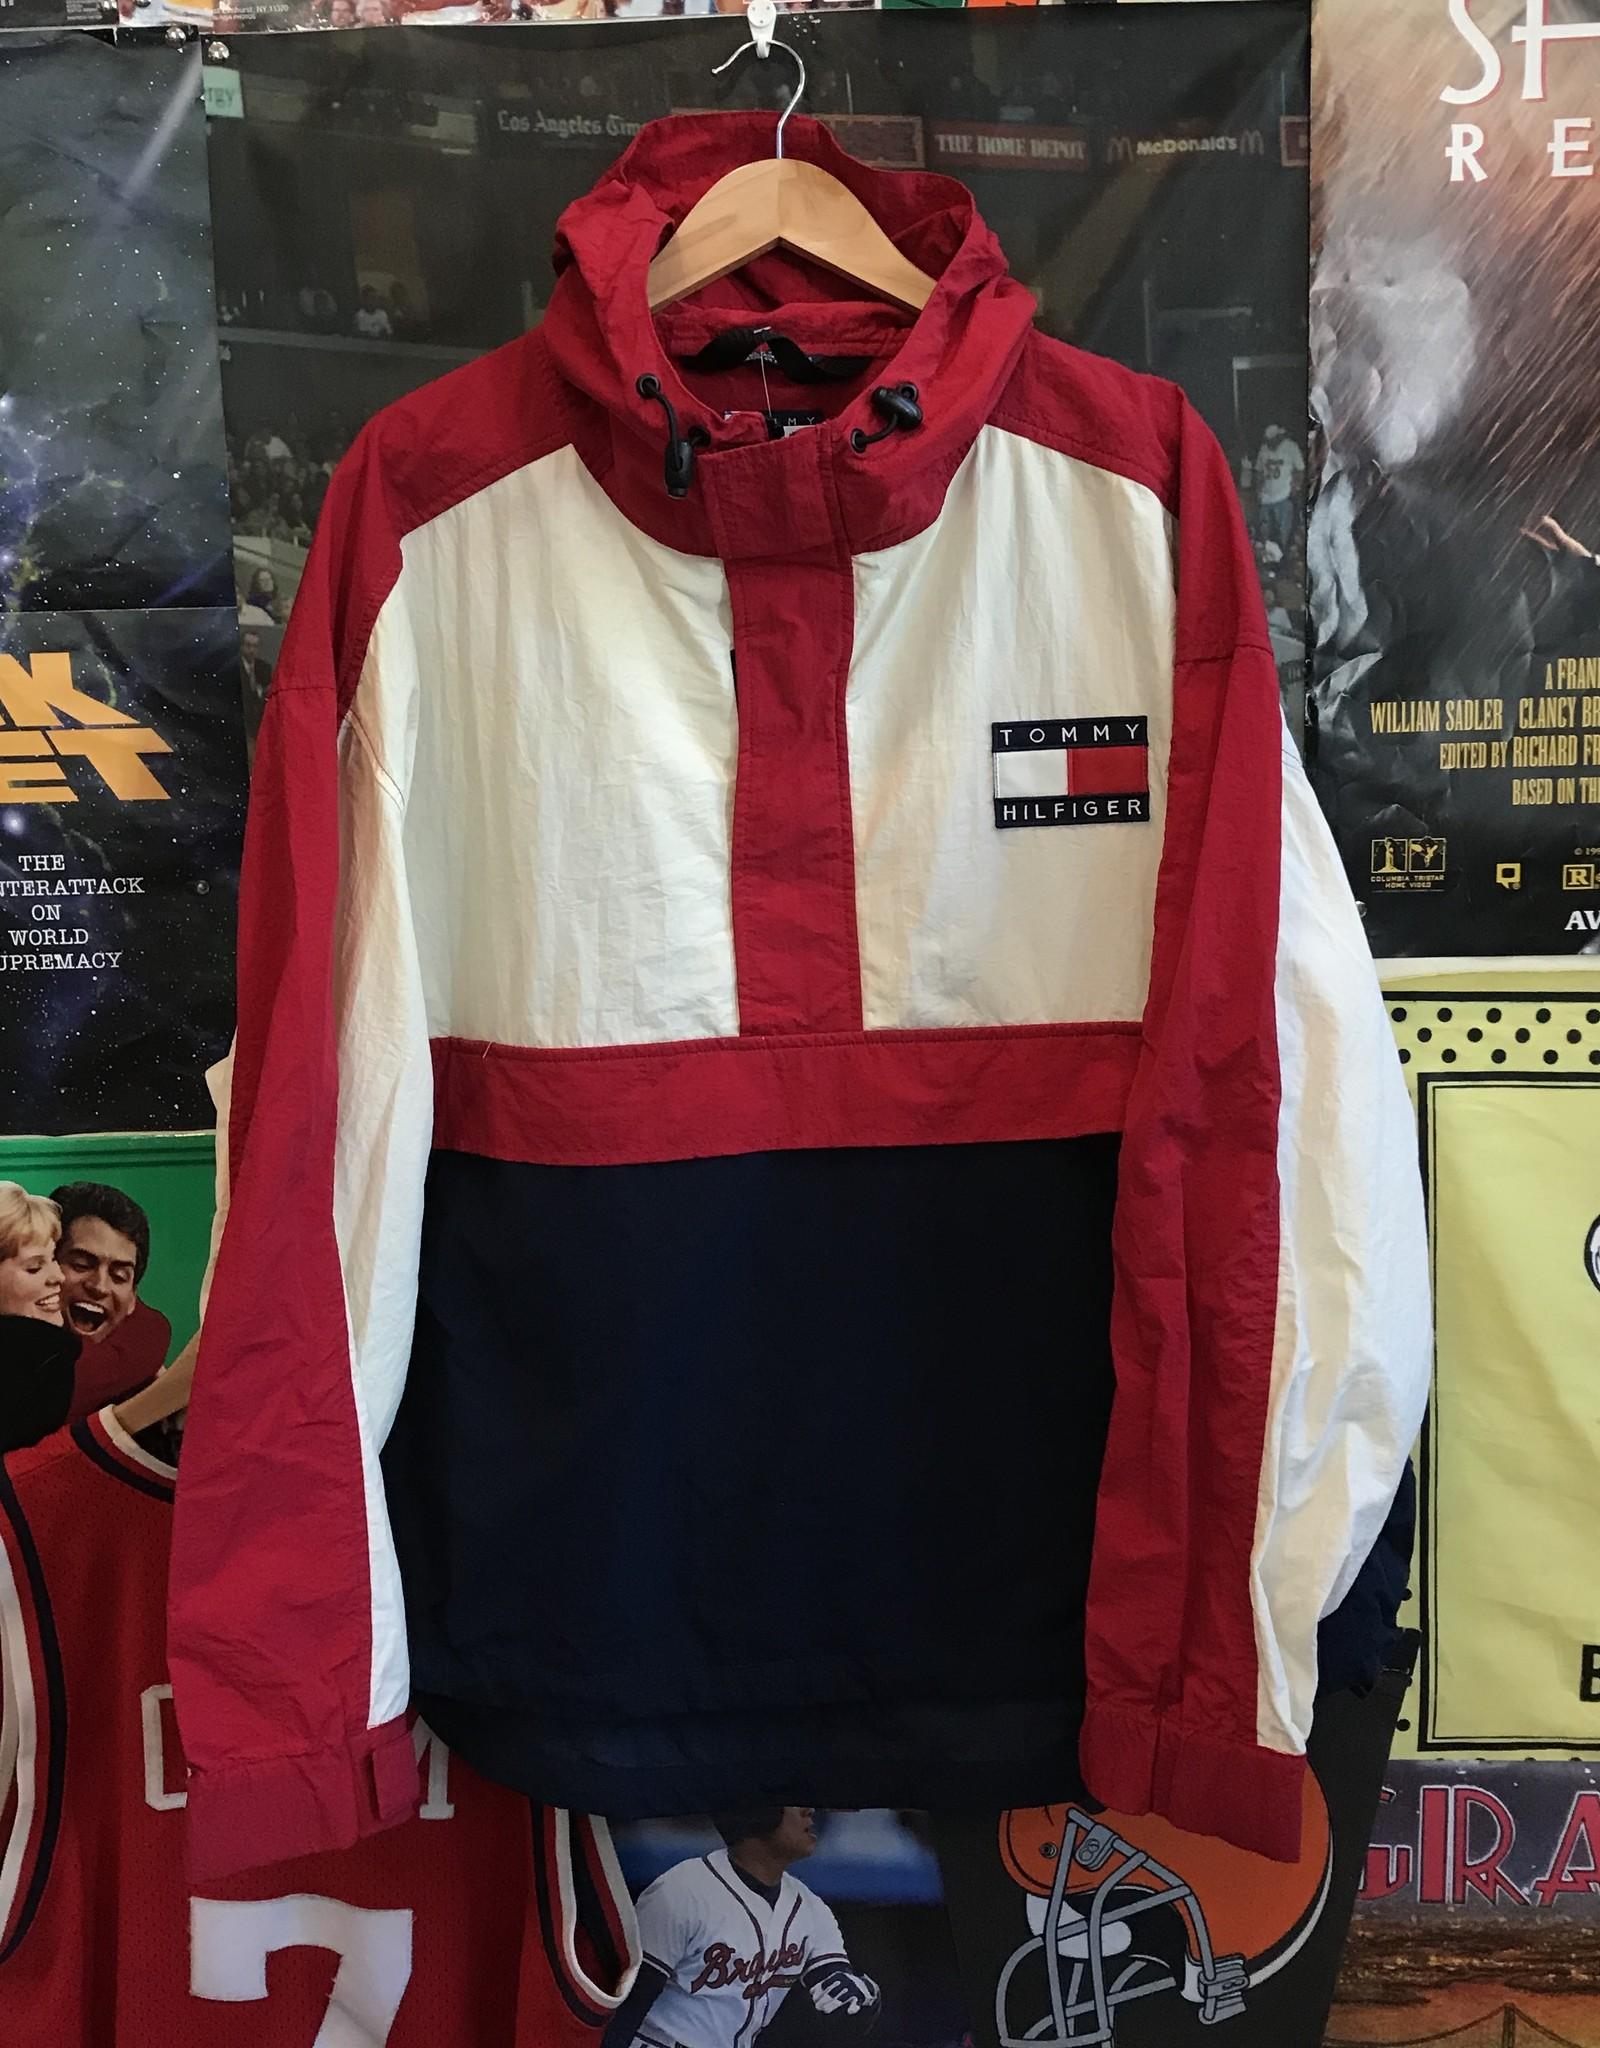 3371tommy jacket red/white/navy sz XL